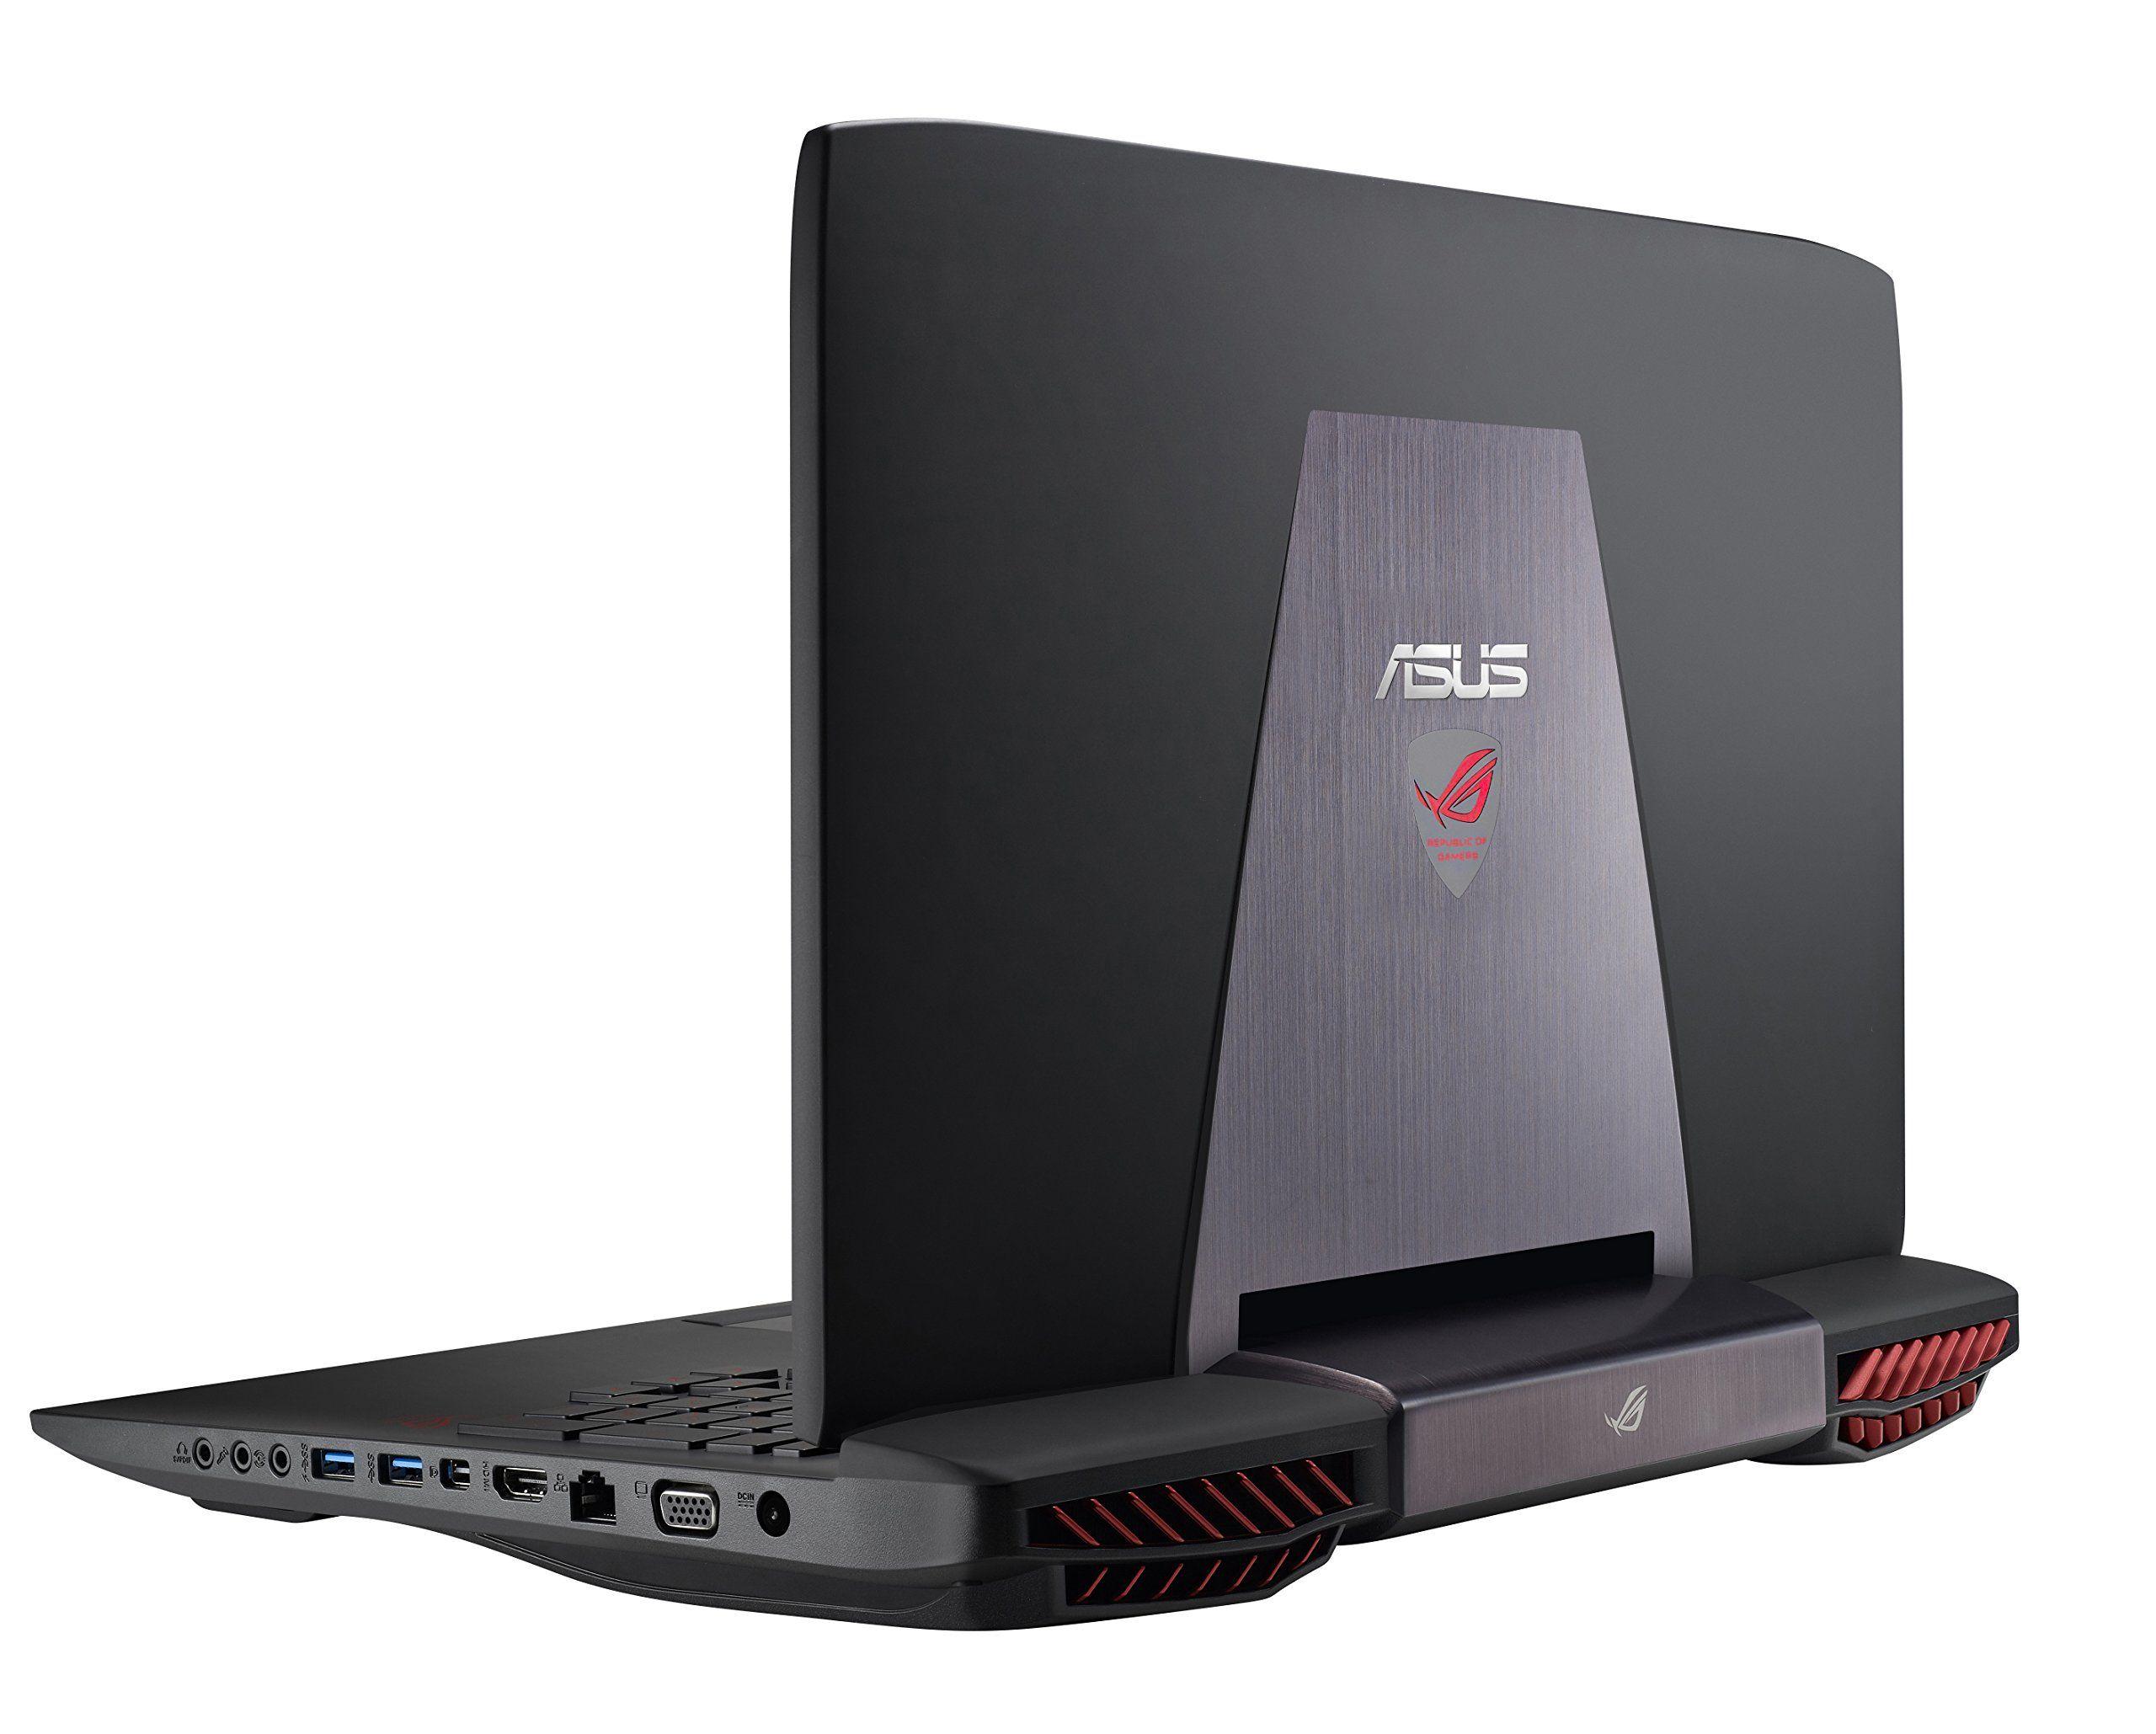 Asus Rog G751jy 17 Inch Gaming Laptop 2014 Computers Accessories Best Gaming Laptop Gaming Laptops Wireless Gaming Headset